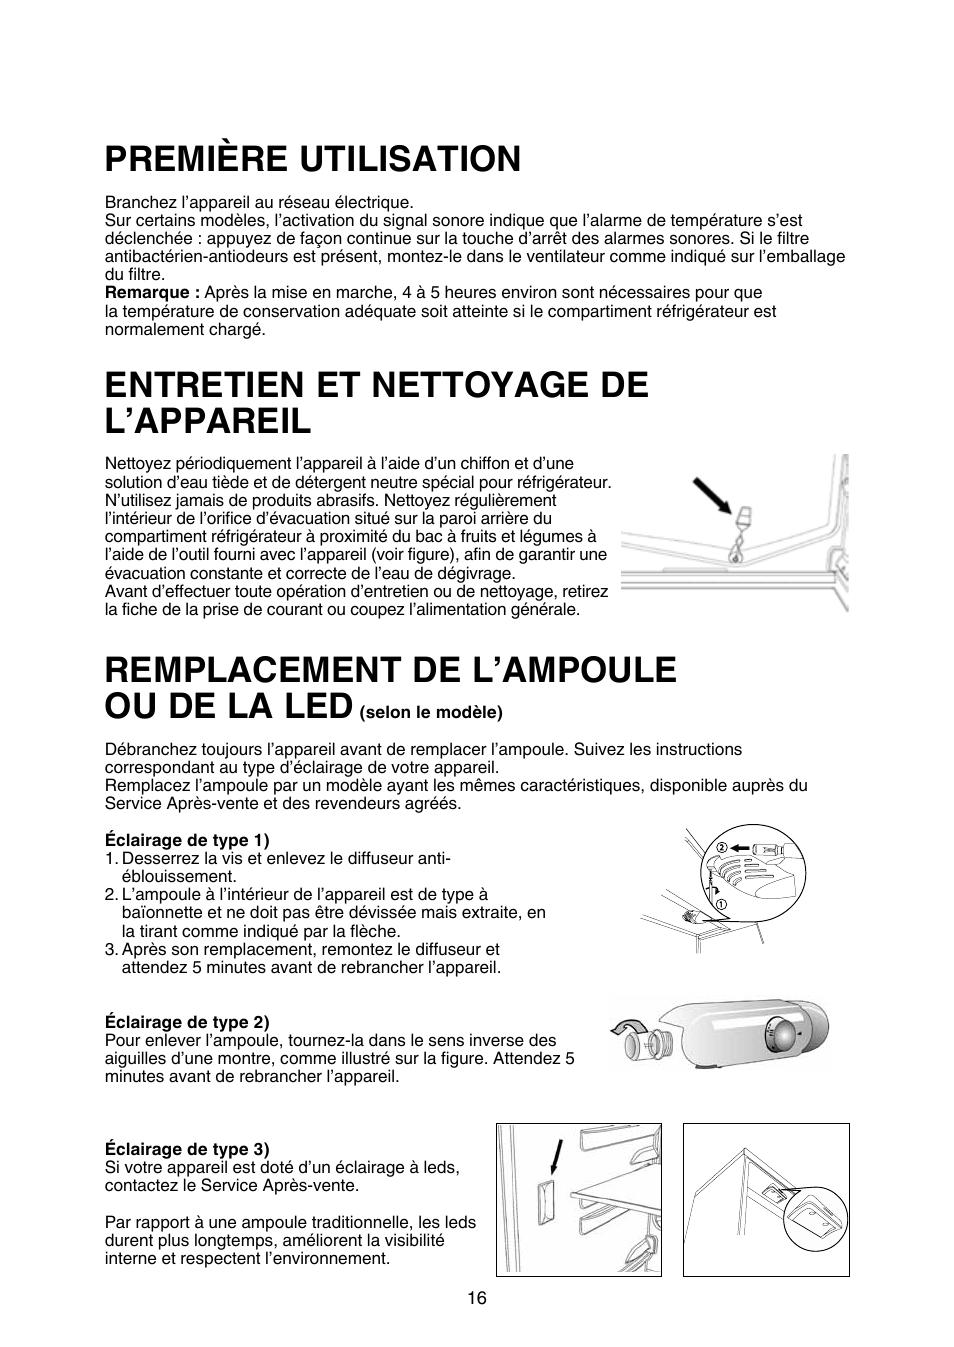 whirlpool art 883-a+-nf manuel d'utilisation   pages: 6